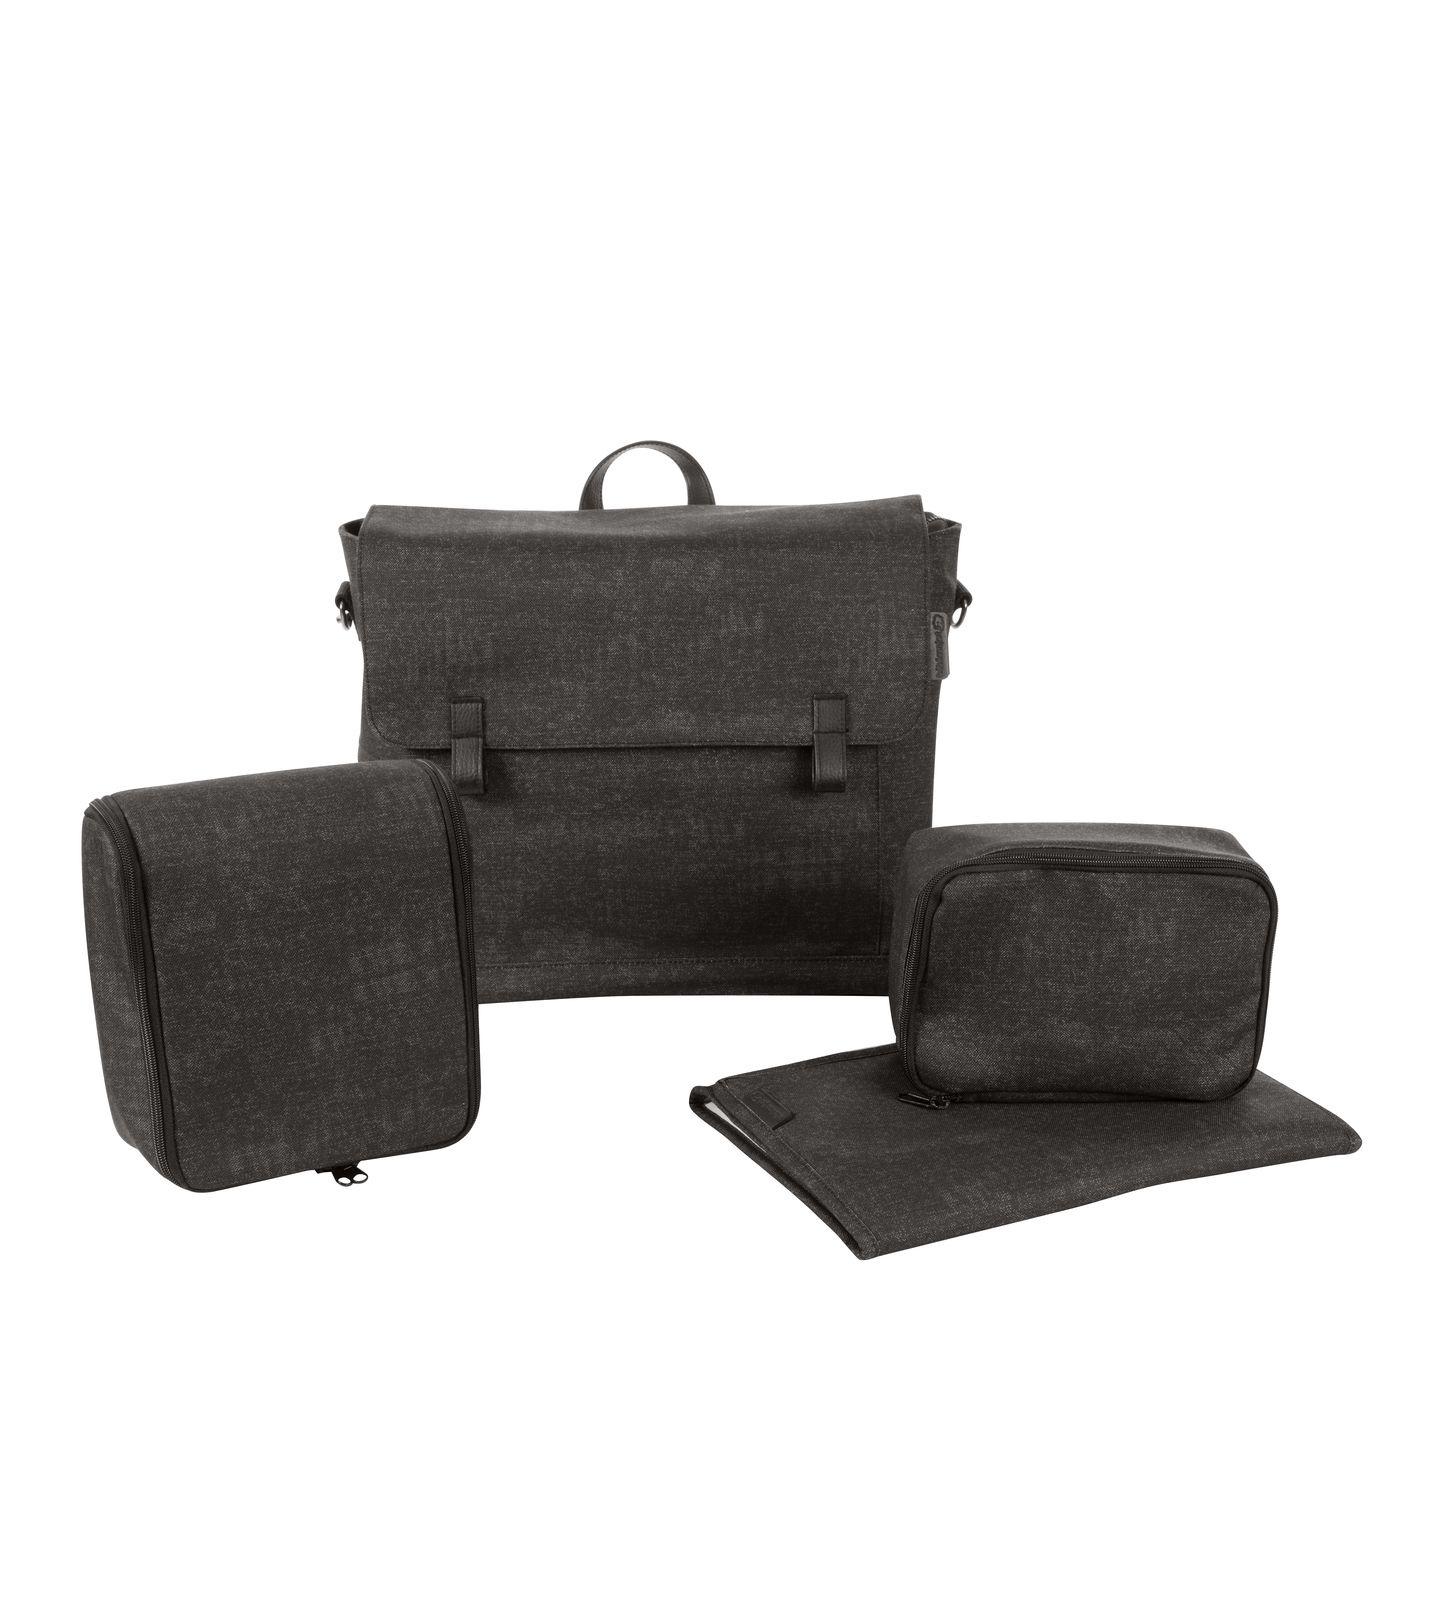 Аксессуар для колясок Bebe Confort MODERN BAG 1632710210 черный цена